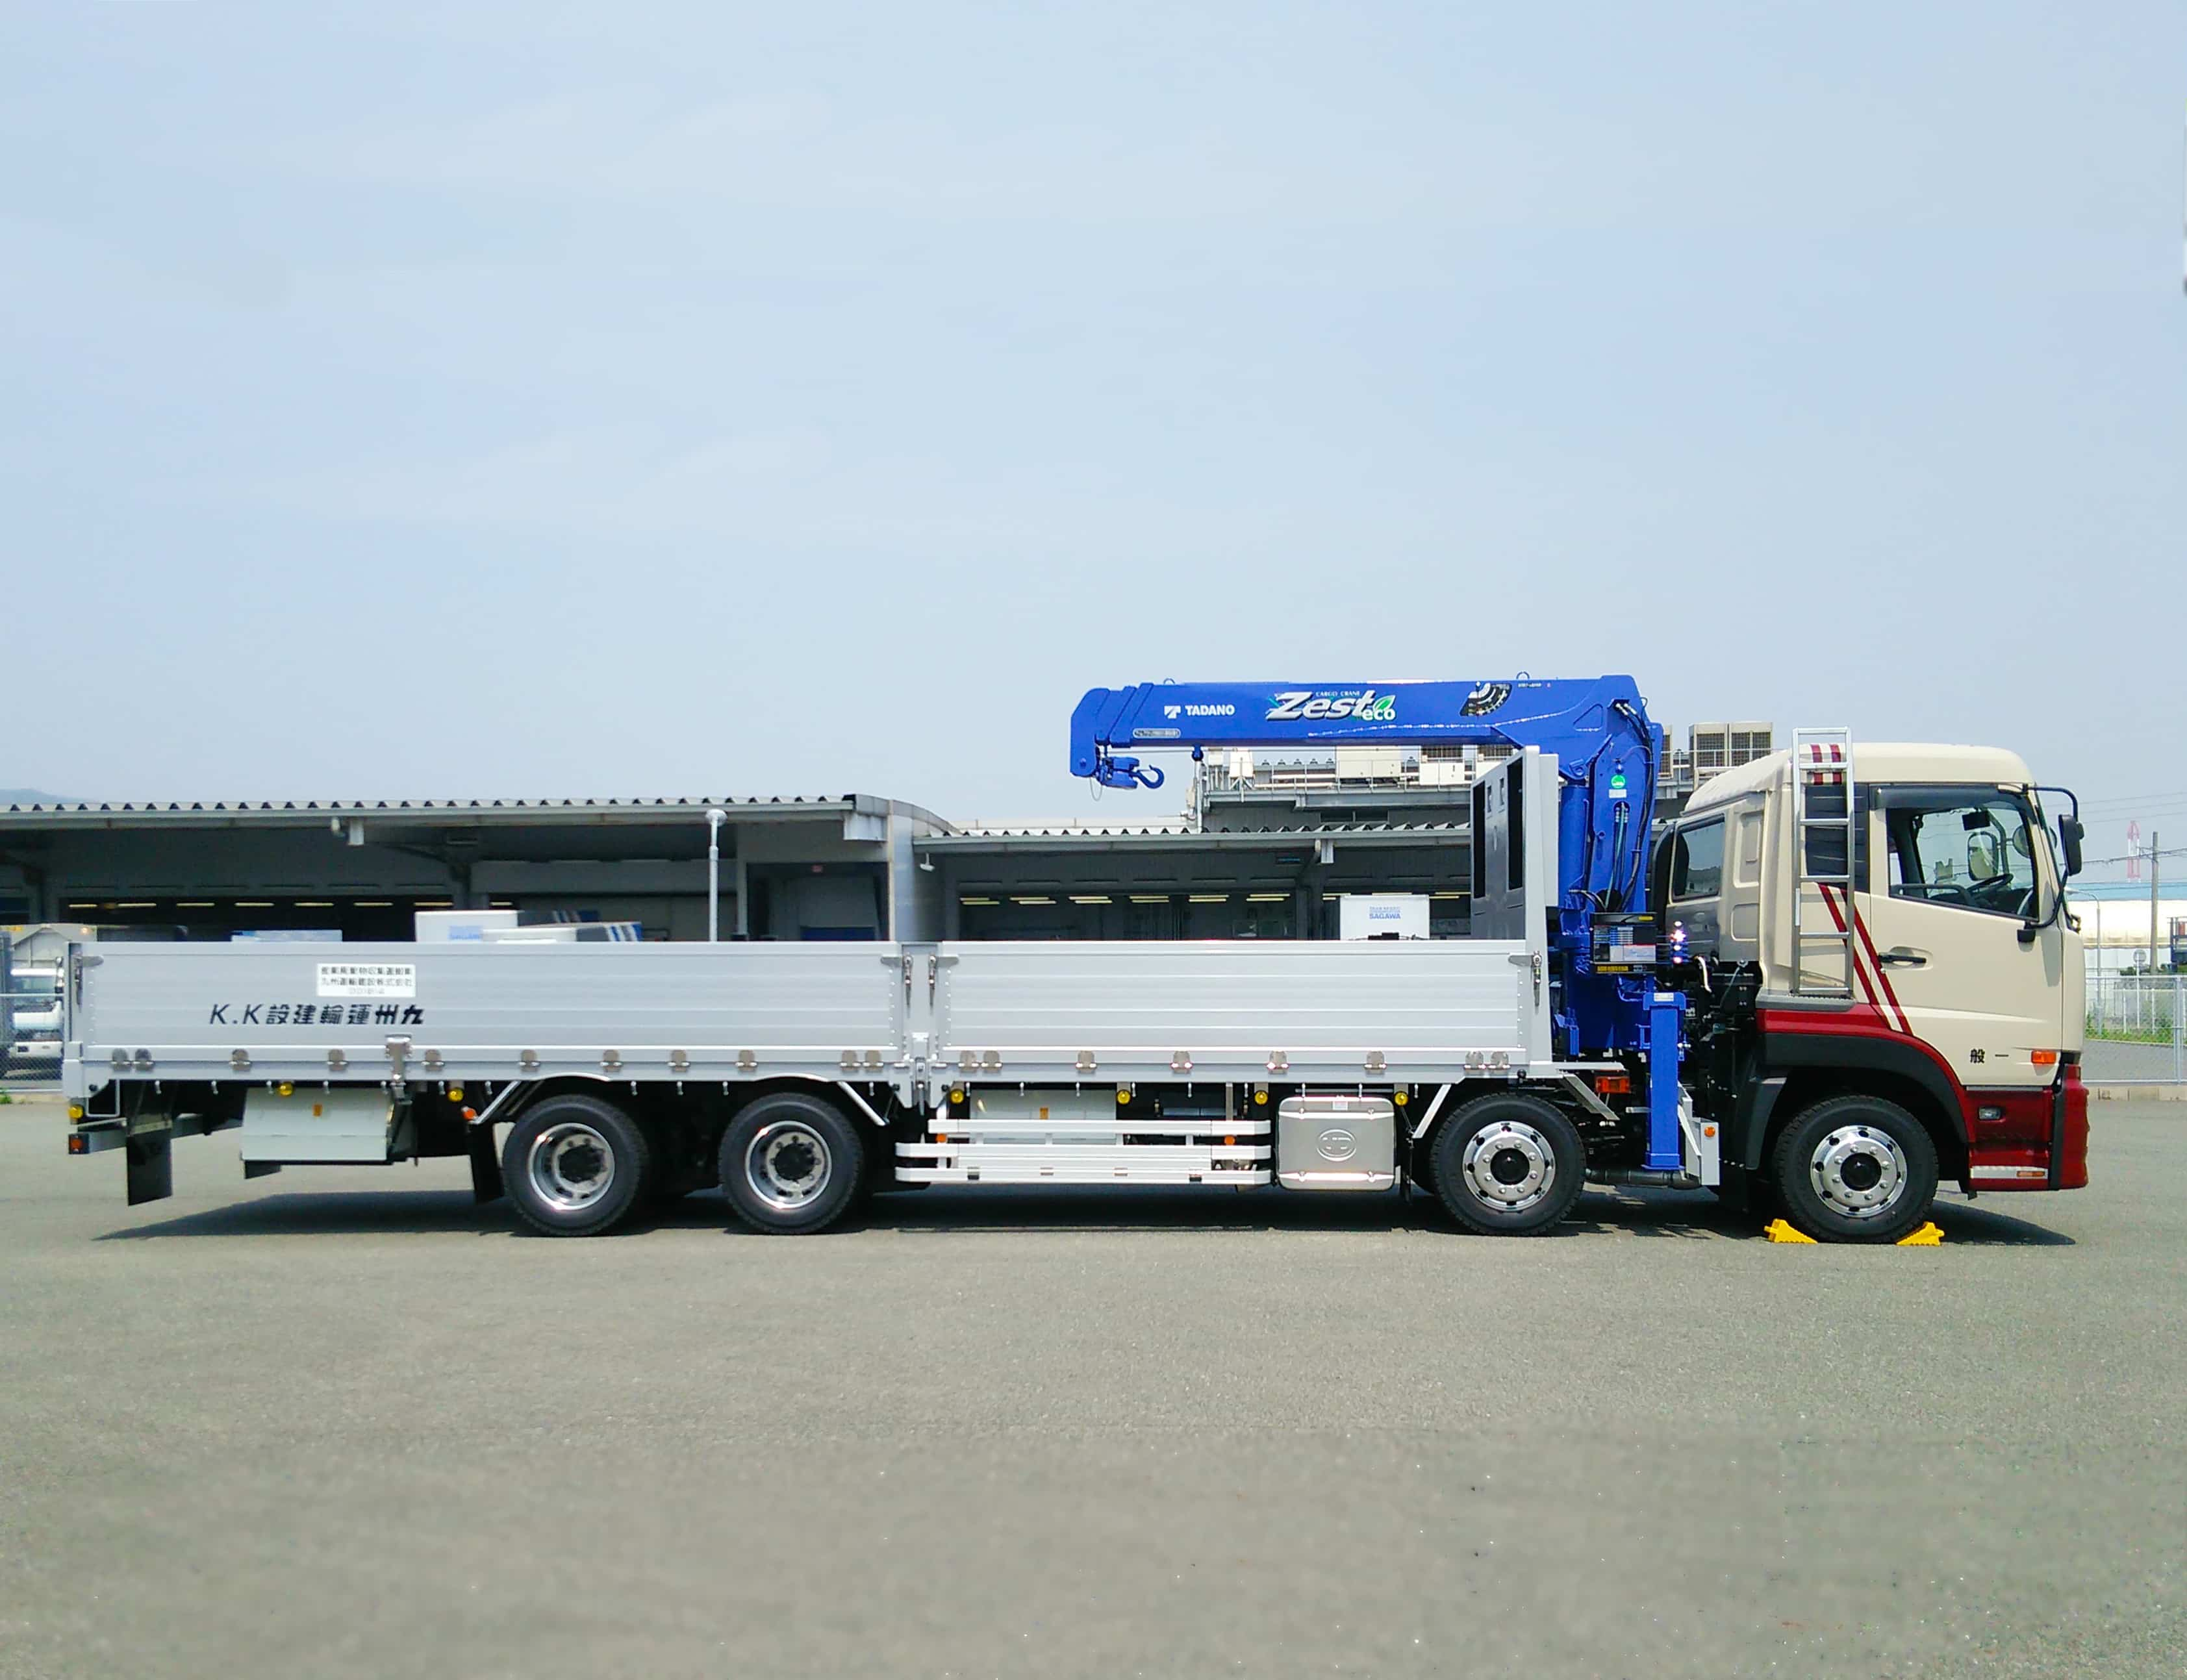 10tクレーン|産業廃棄物収集運搬|九州運輸建設株式会社|北九州市